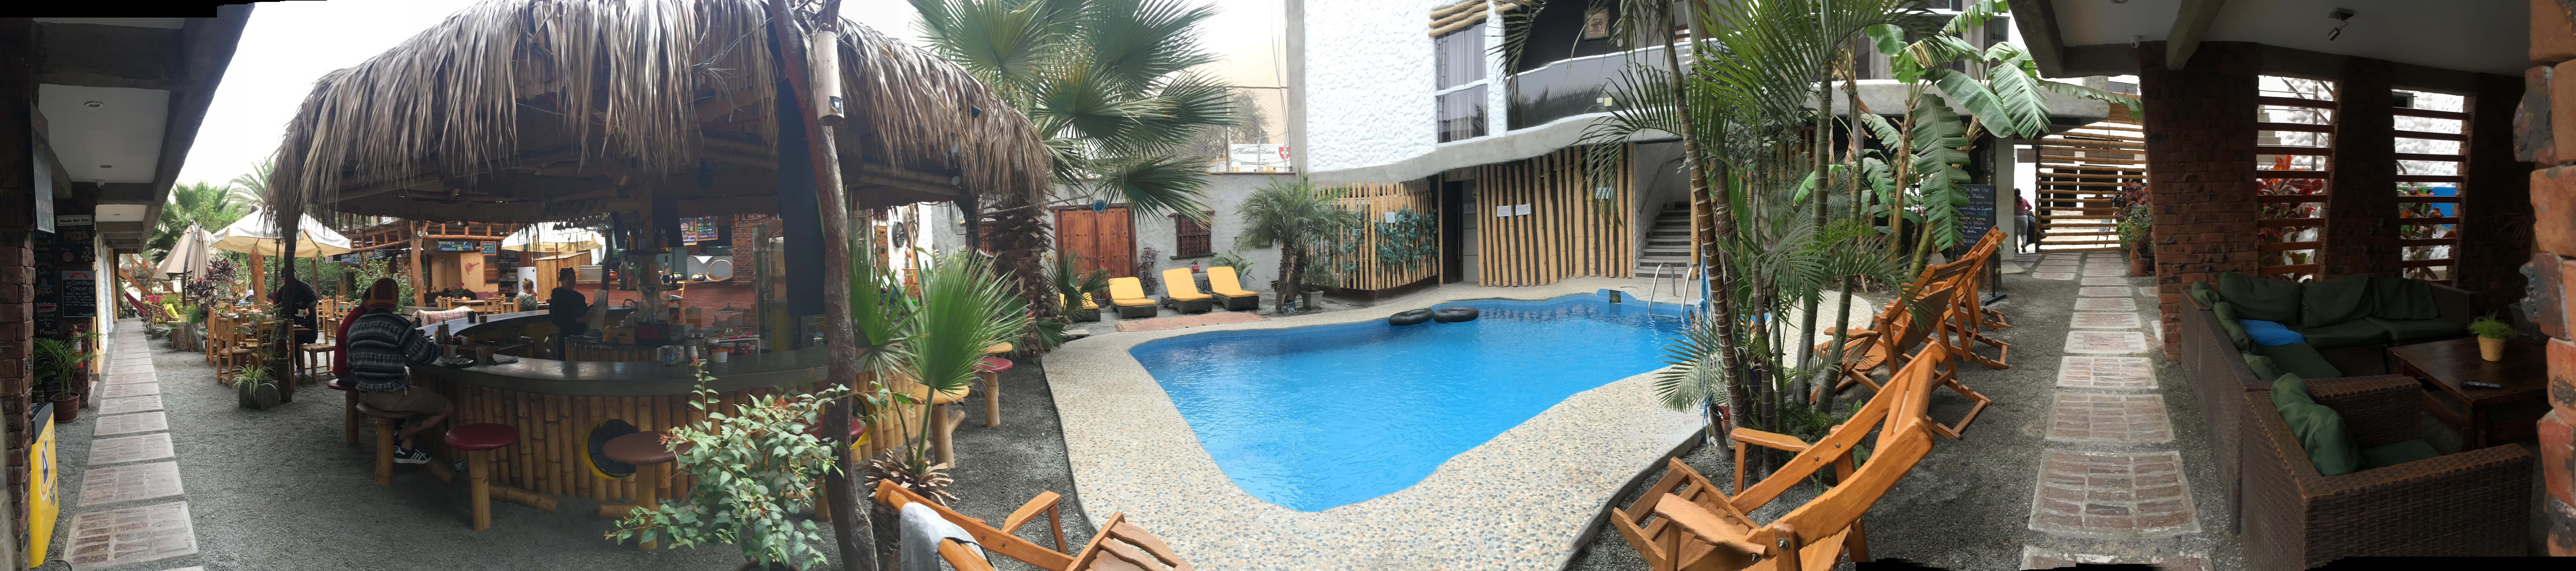 Bananas hostel in Huaccachina Peru